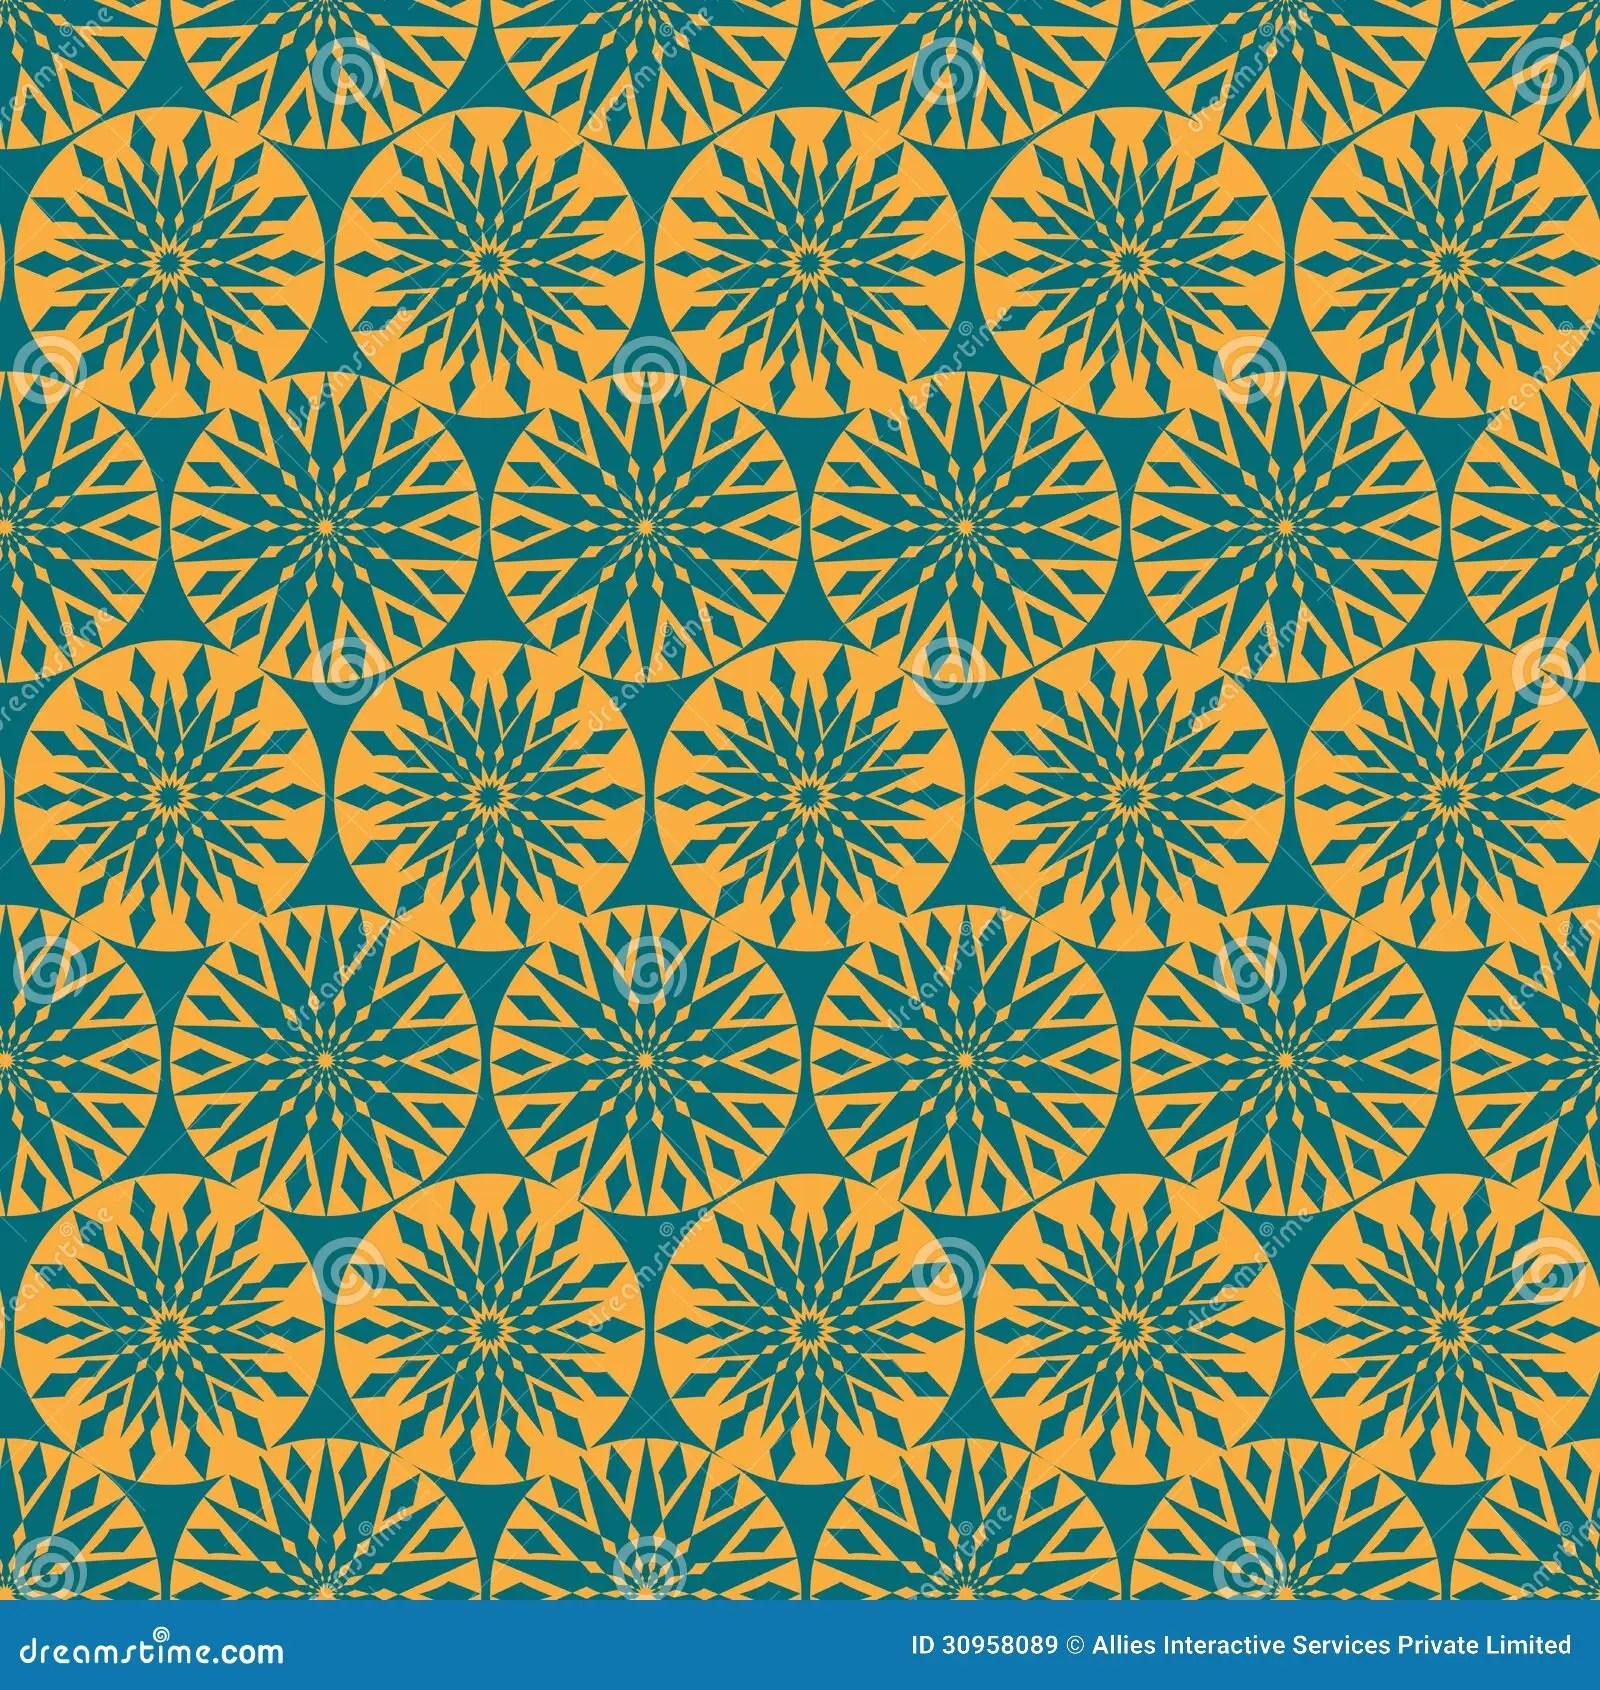 Tribal Pattern Wallpaper Hd Arabic Or Islamic Ornaments Pattern Royalty Free Stock